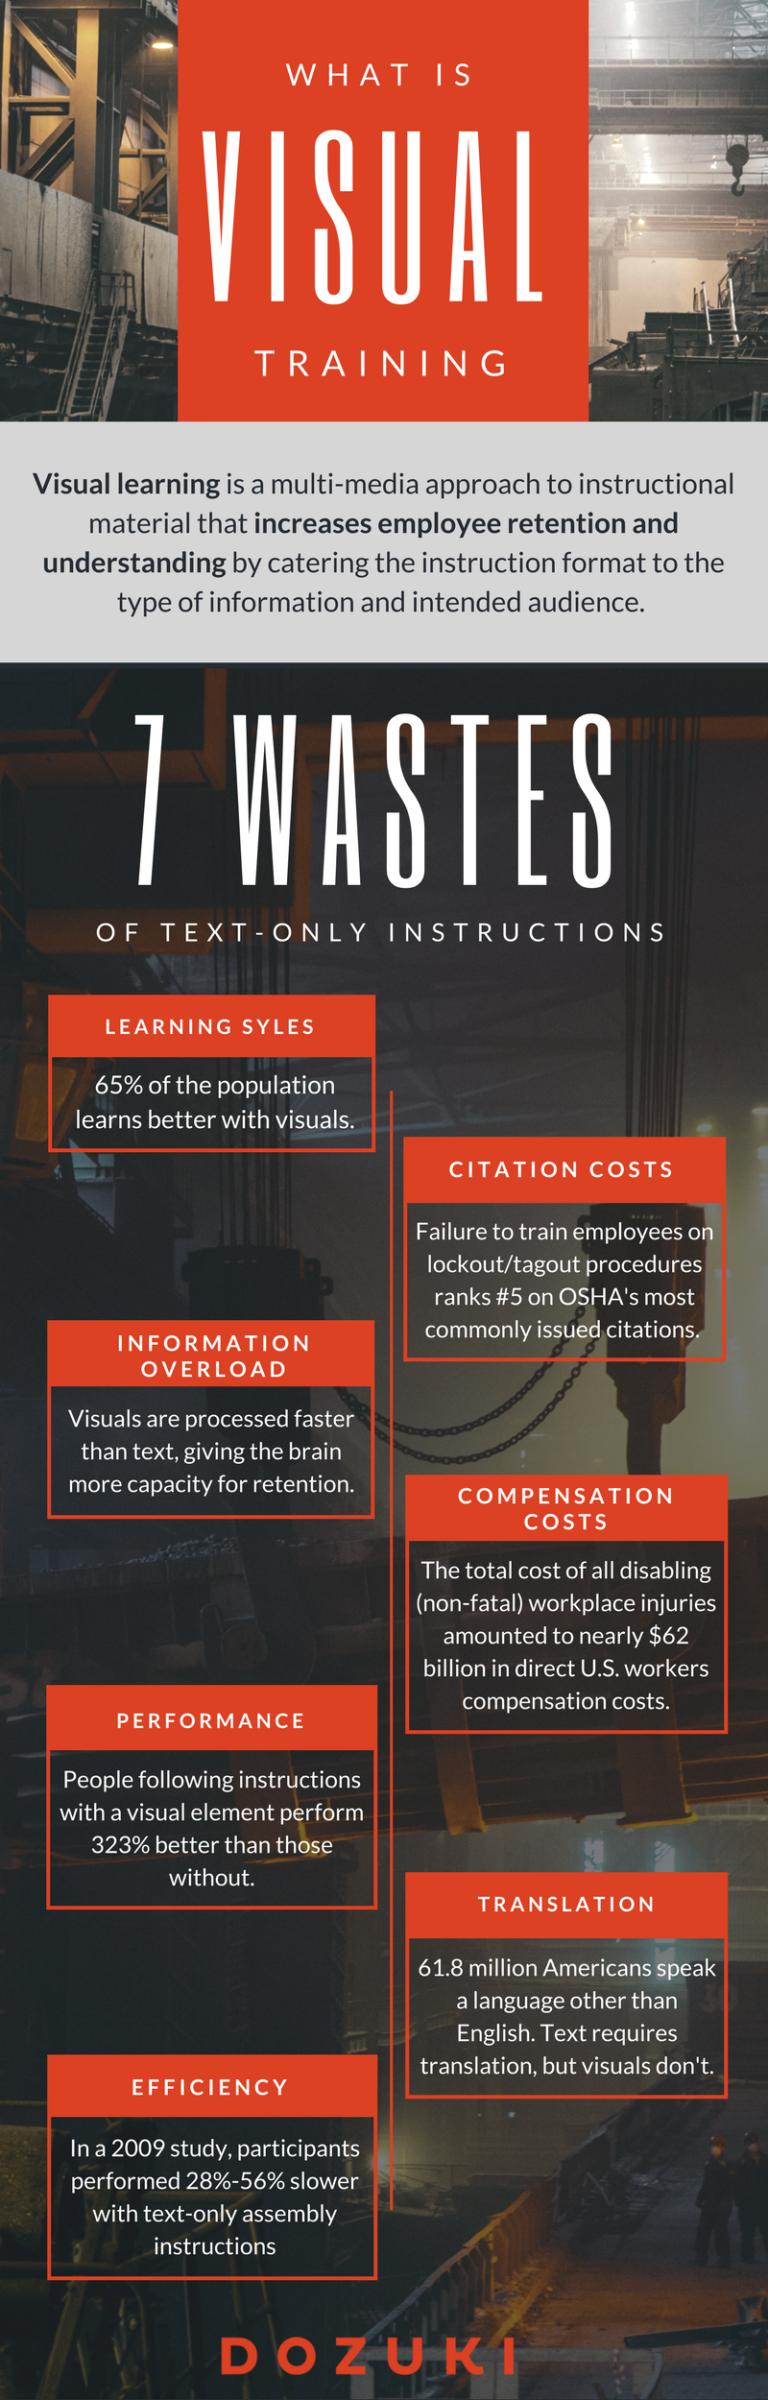 Visual training infographic